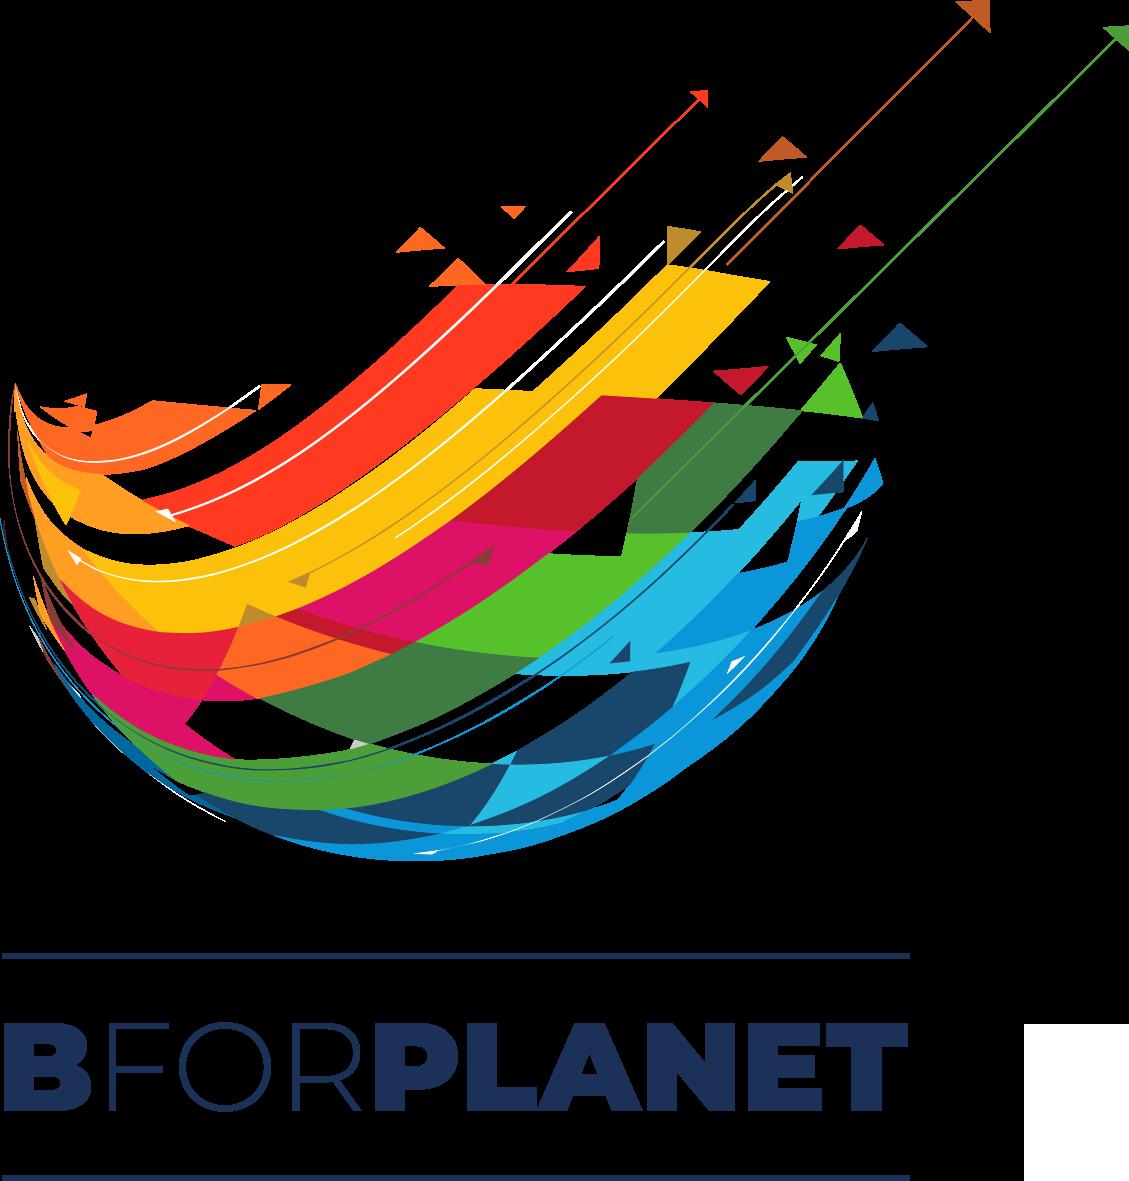 BforPlanet_logo